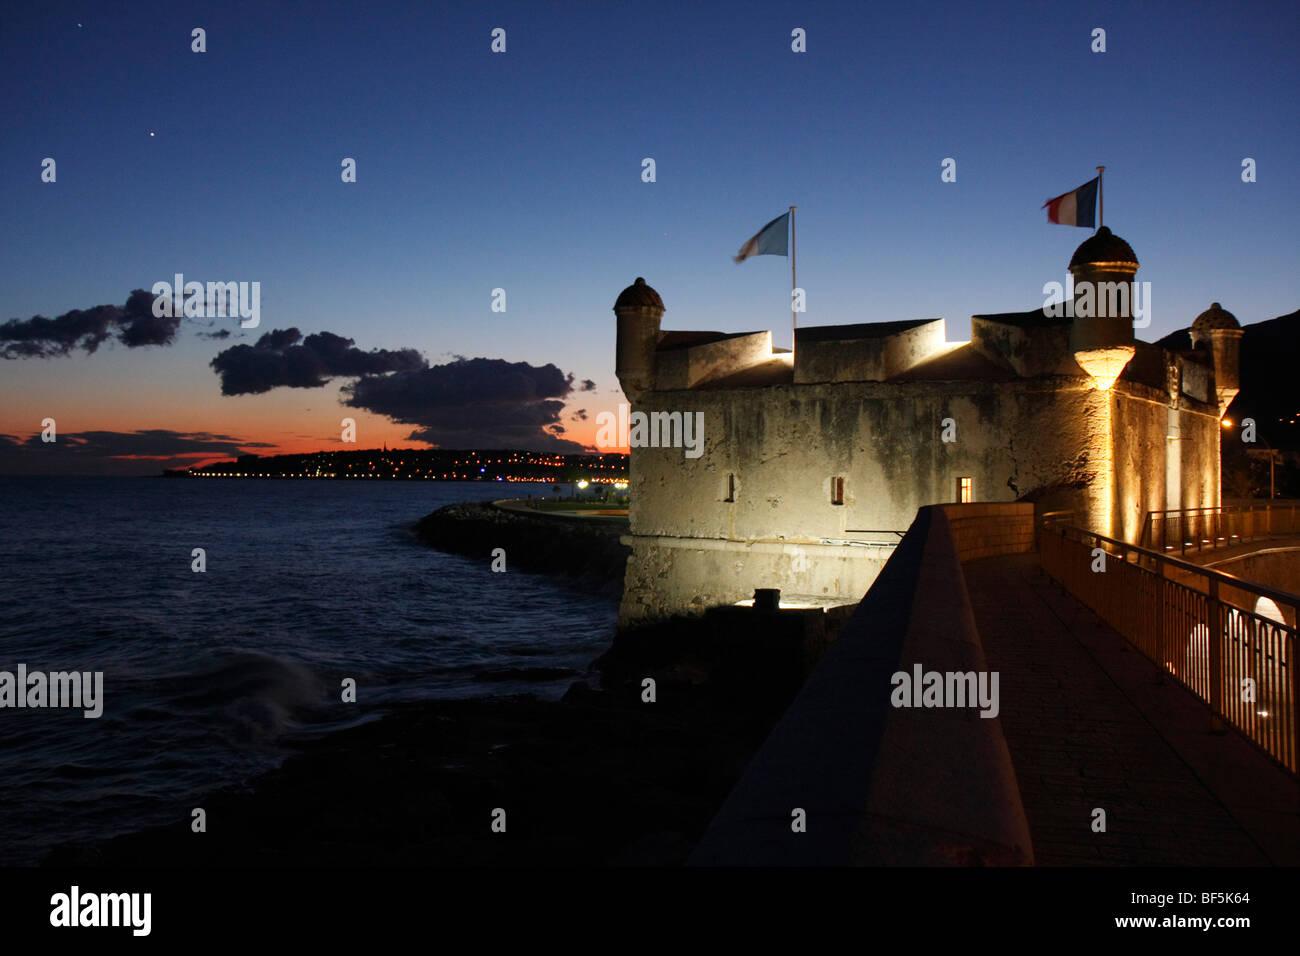 Bastion and Cap Martin, Menton, Alpes Maritimes, Cote d'Azur, France, Europe - Stock Image